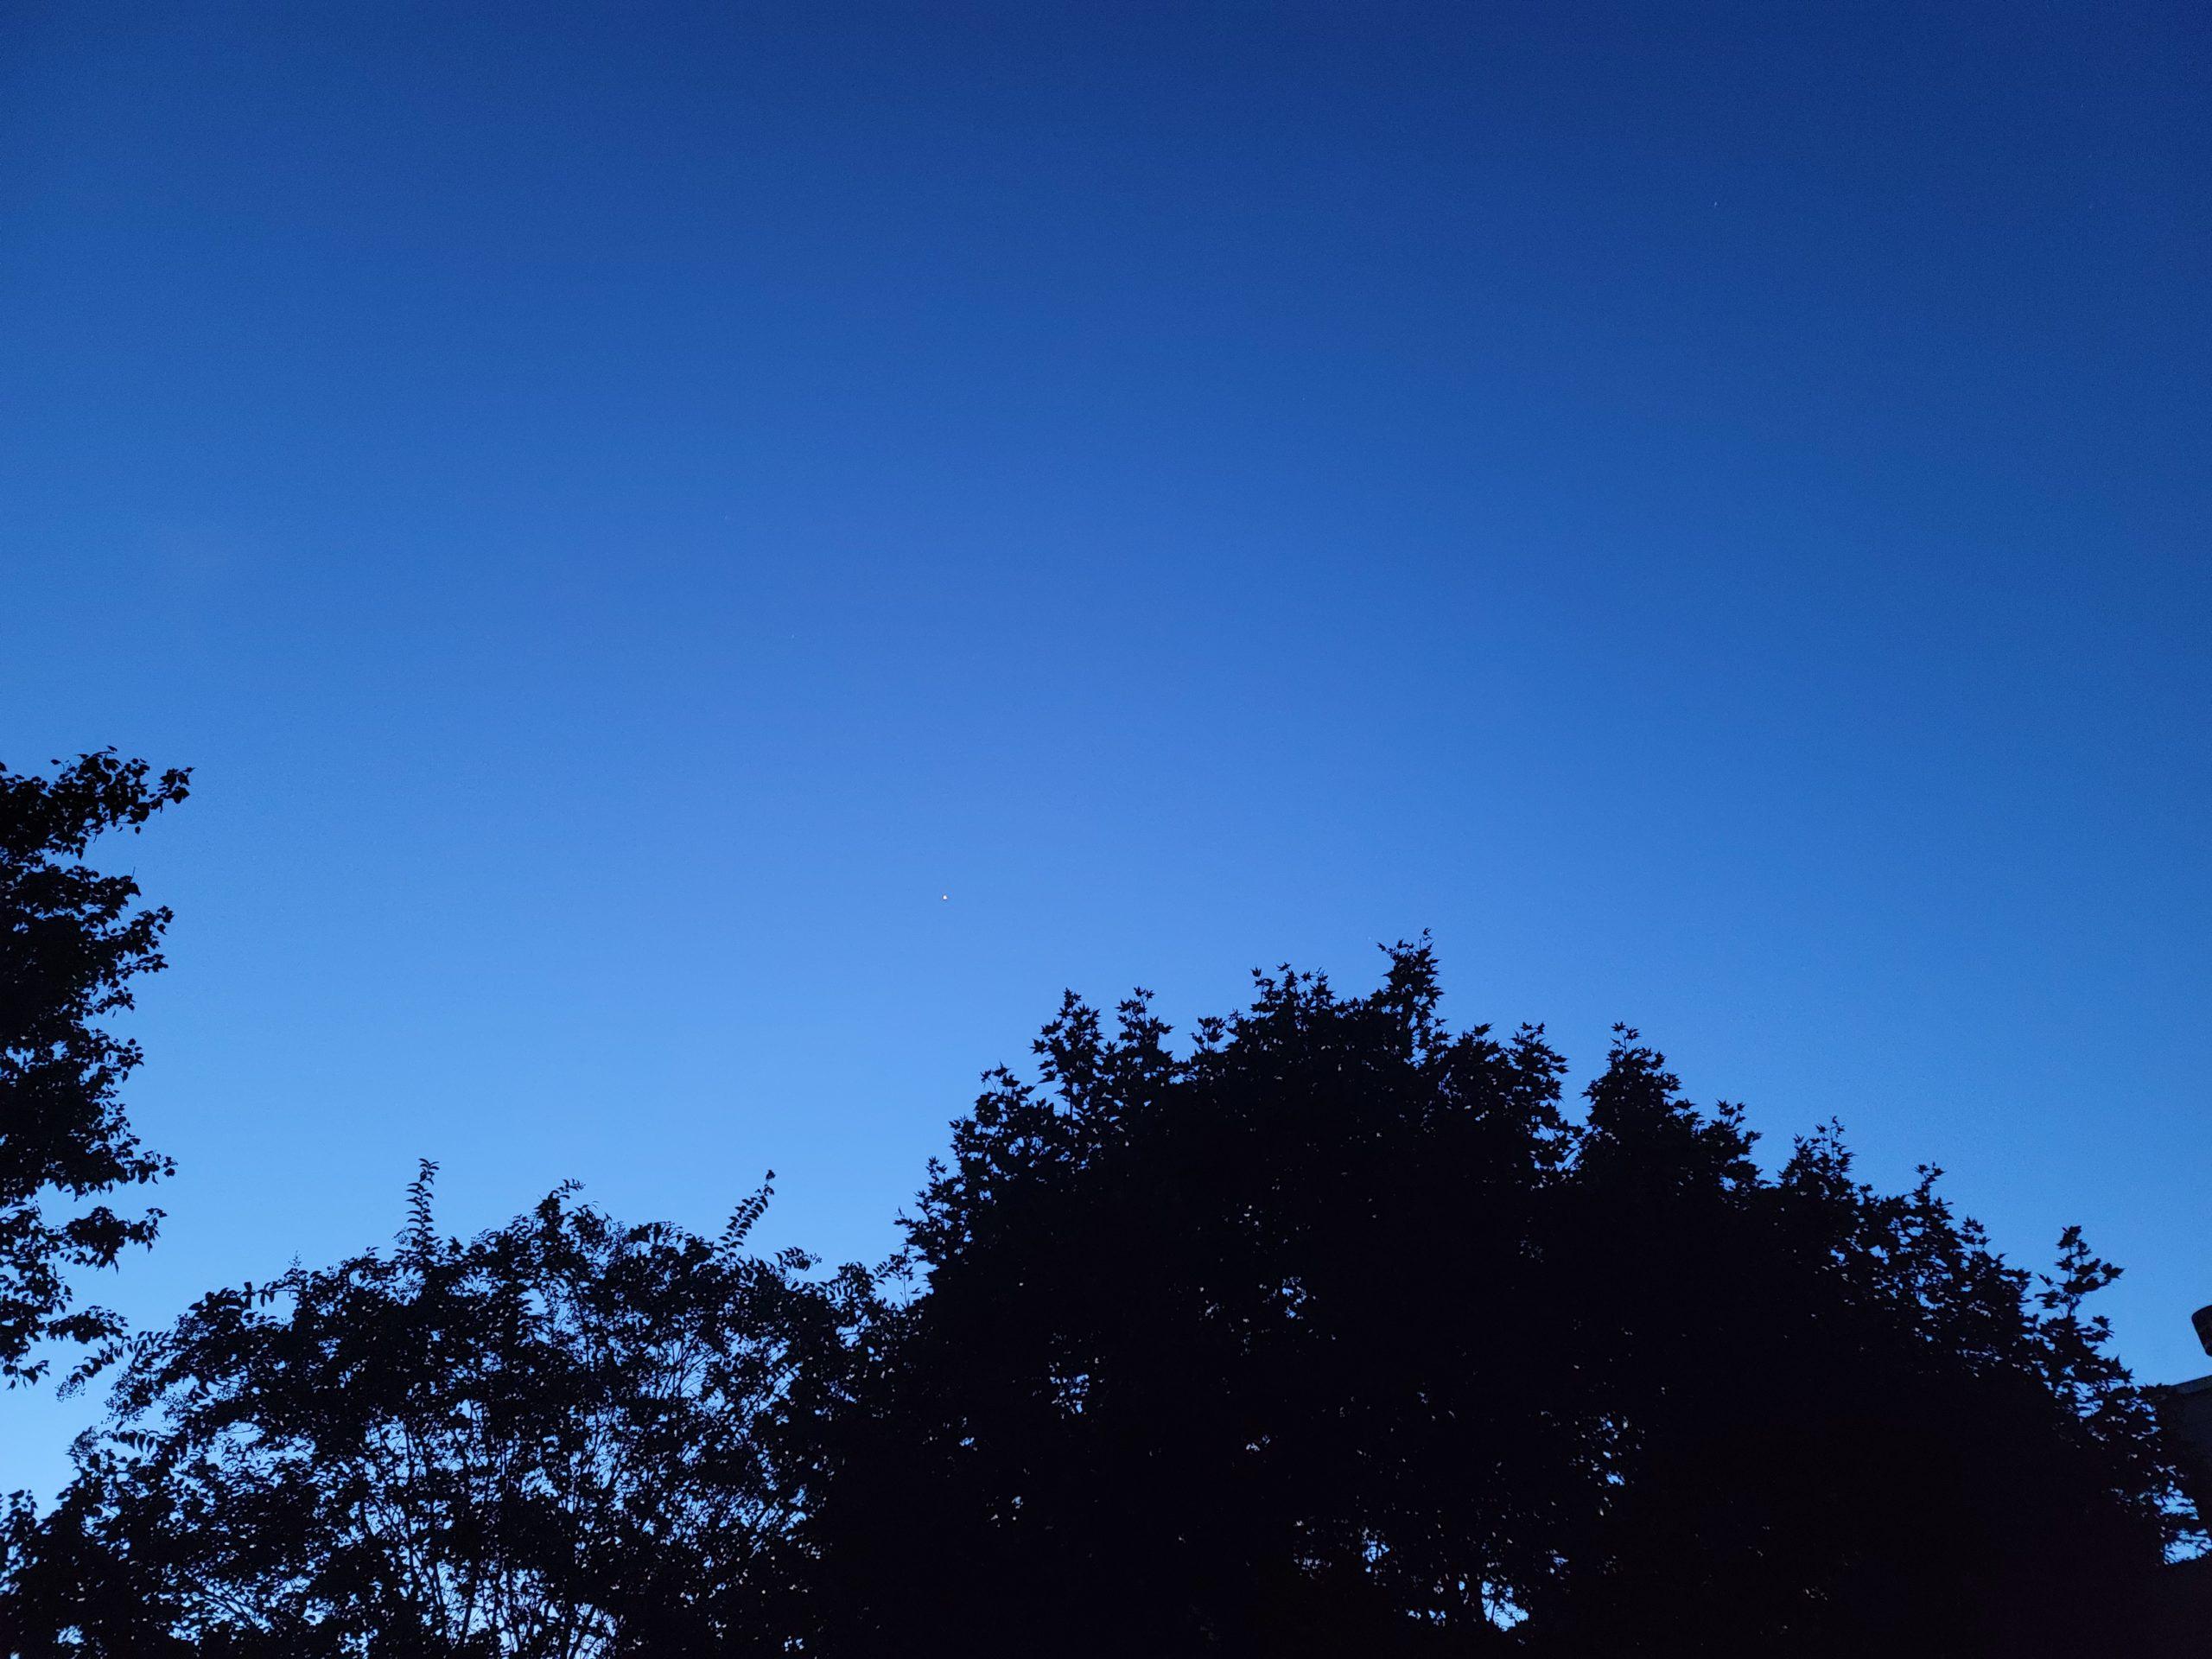 Venus 6:45 a.m. EDT